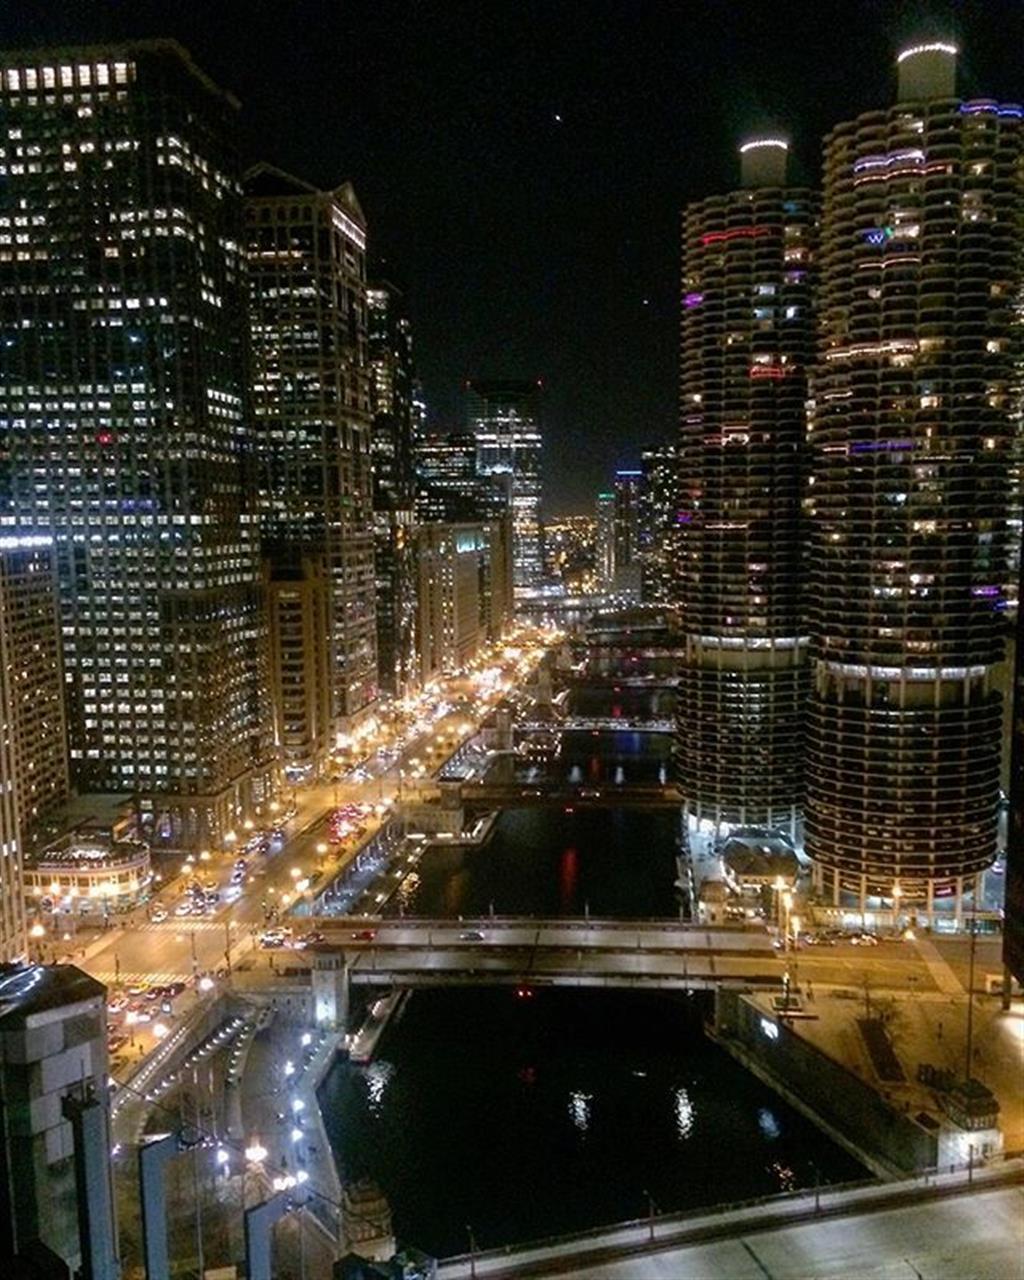 Ribbons of light along #wackerdrive #chicago #londonhousechicago #rooftops #leadingrelocal #bairdwarner #citywelove #realestate